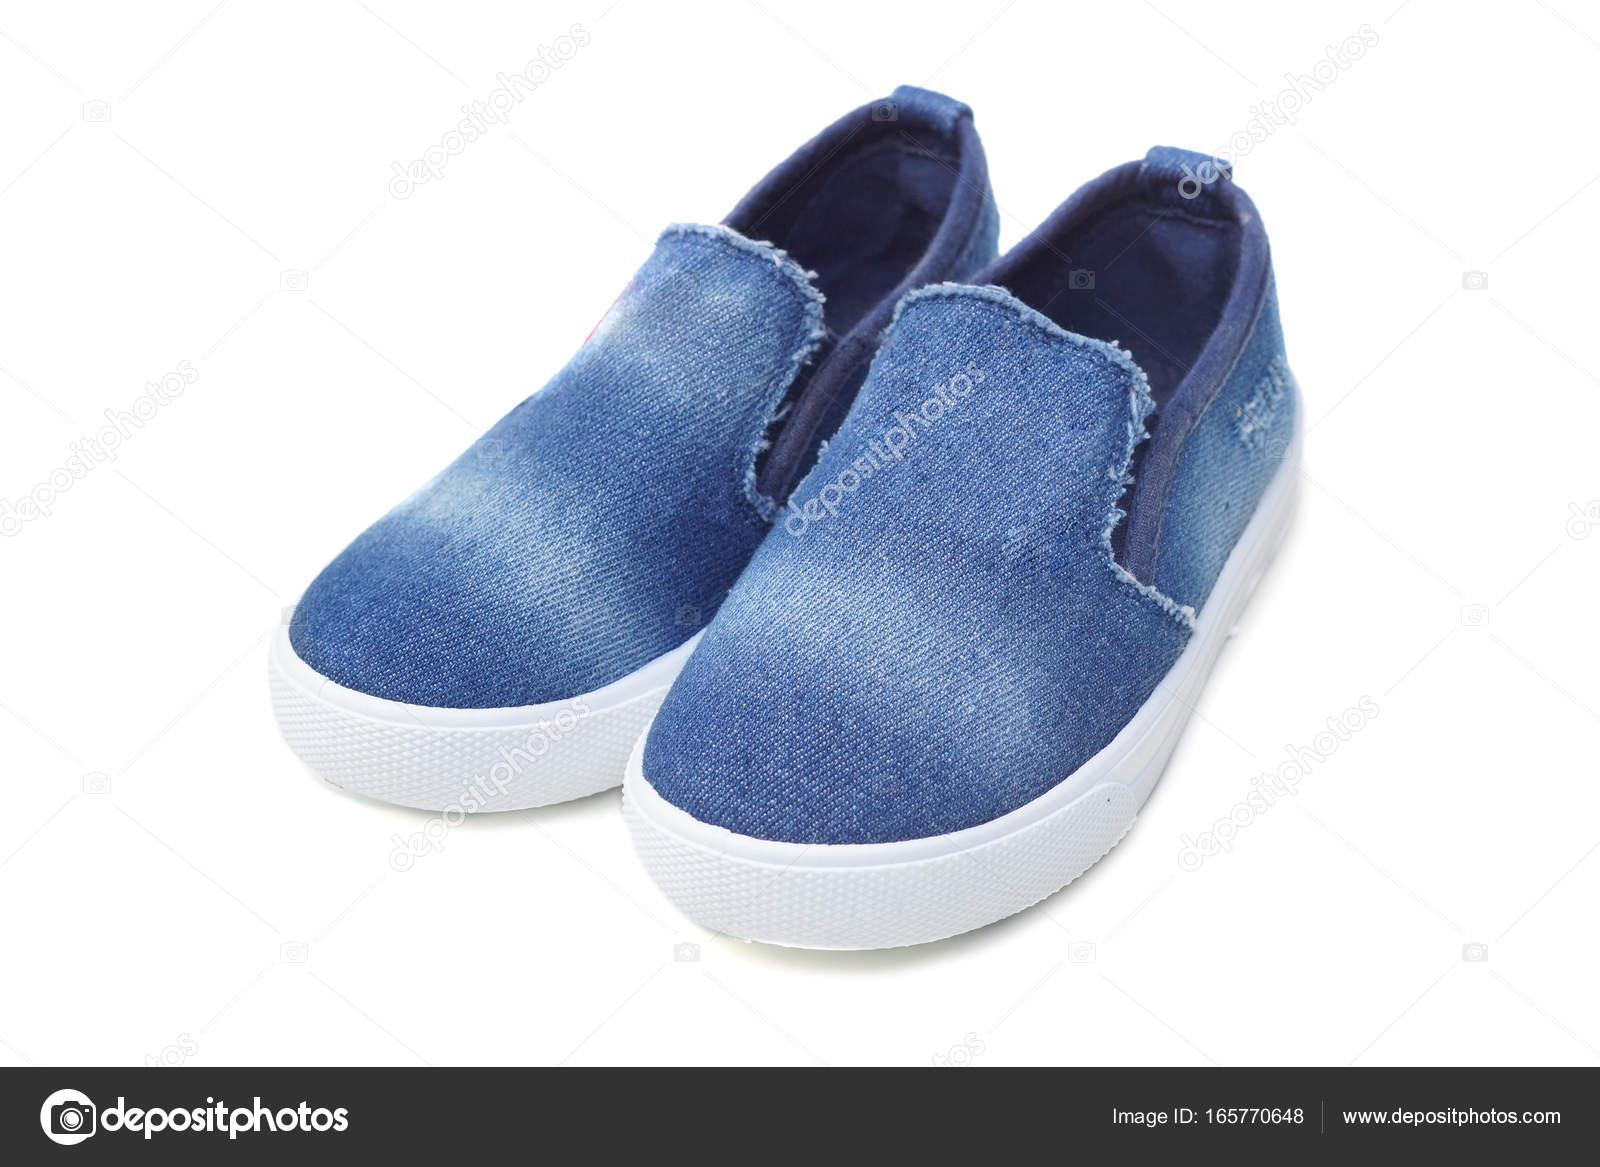 cdbcfdf67d2 Ζαν τζιν παντοφλέ παπούτσια — Φωτογραφία Αρχείου © weerapat #165770648